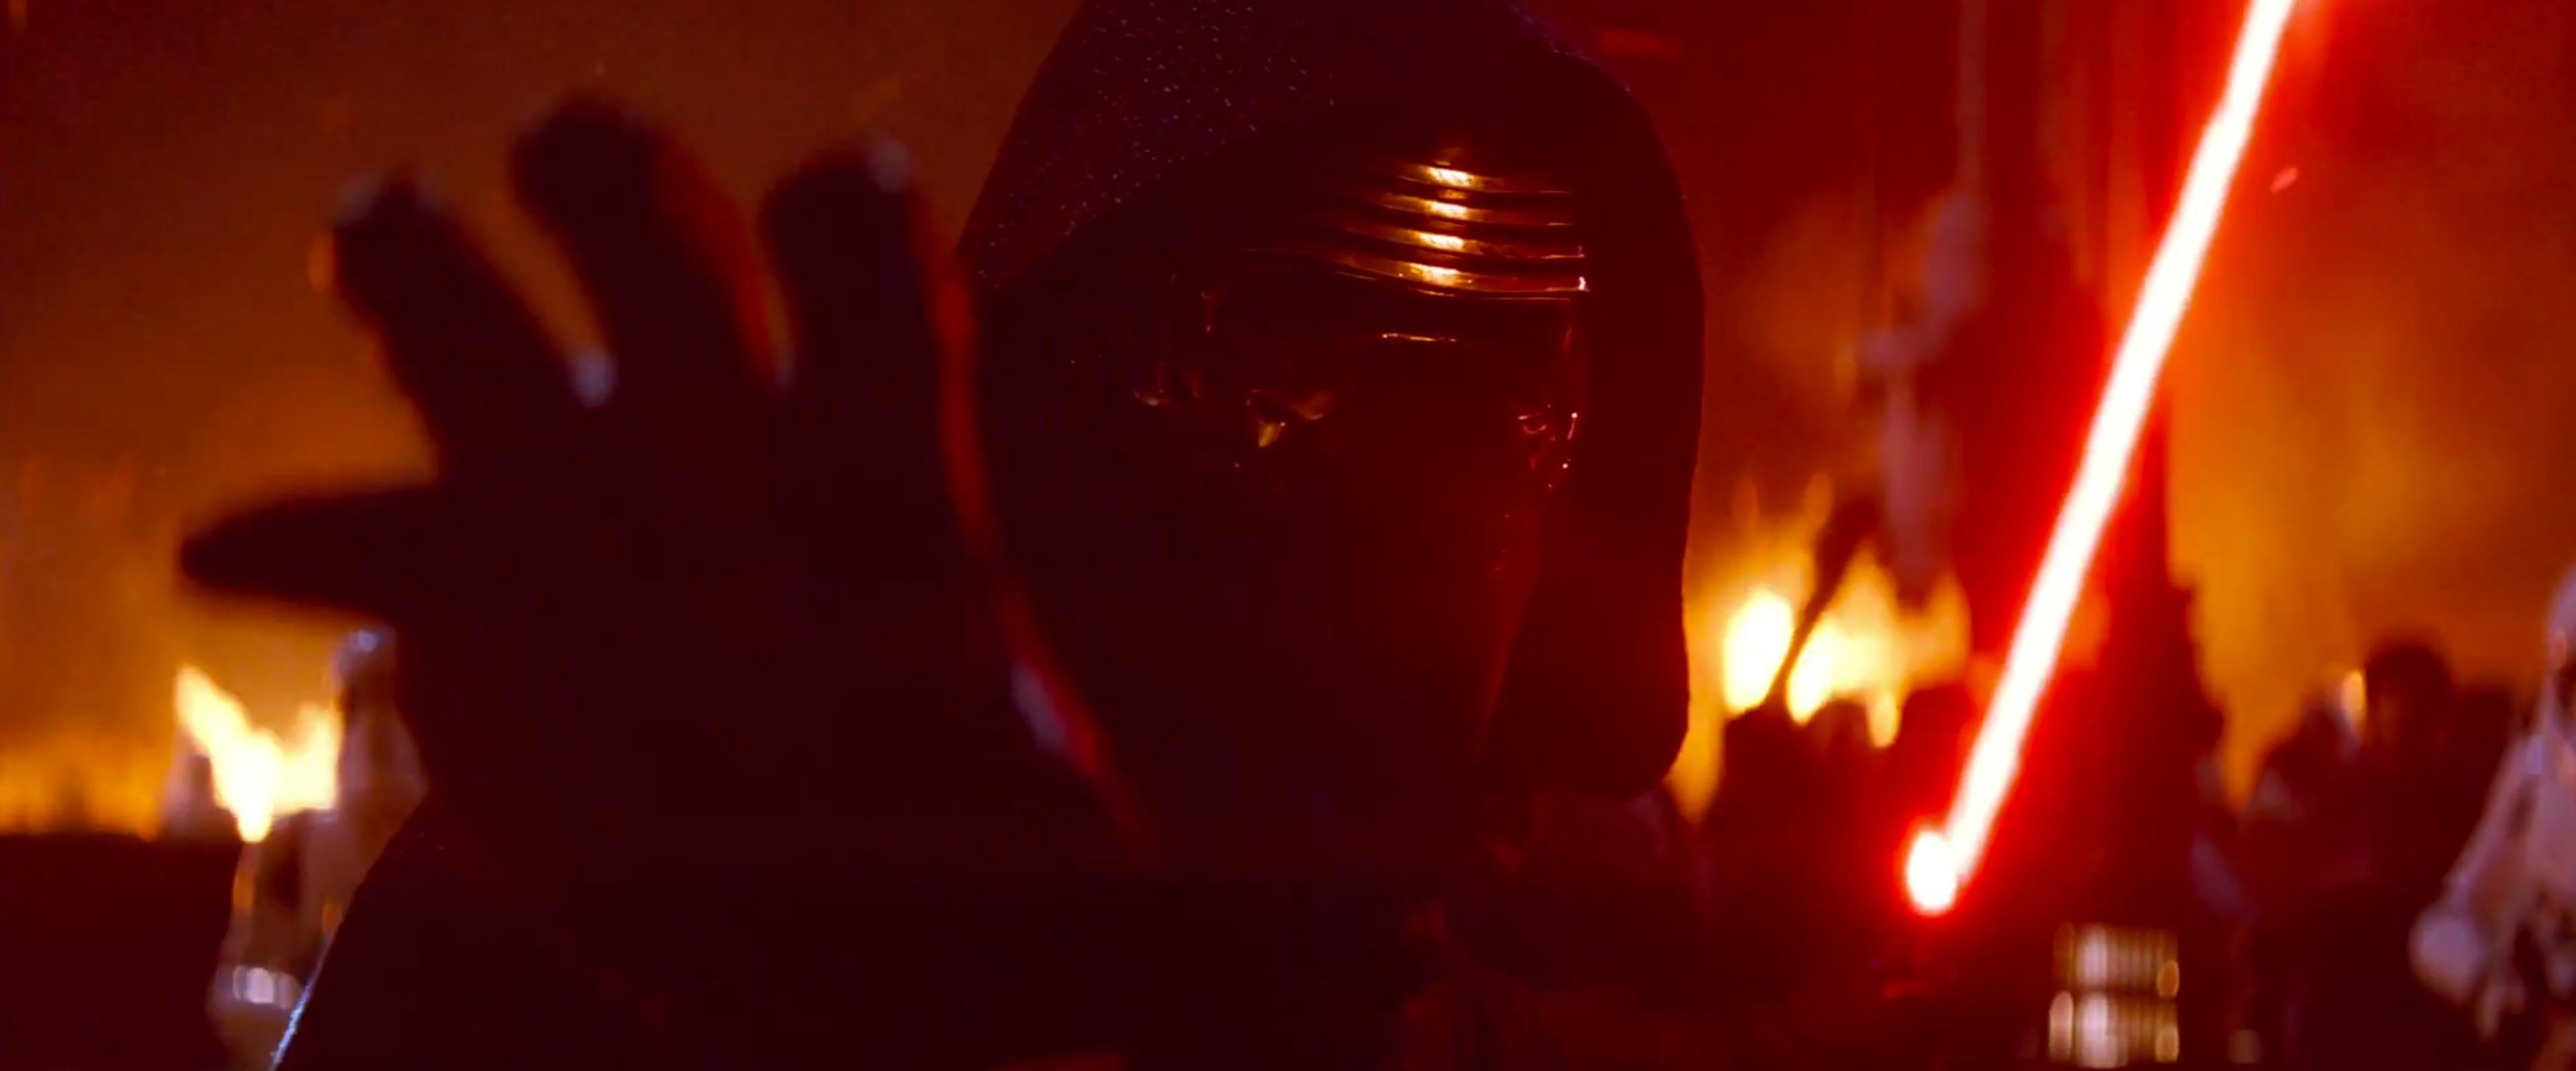 Star-Wars--The-Force-Awakens_3dart